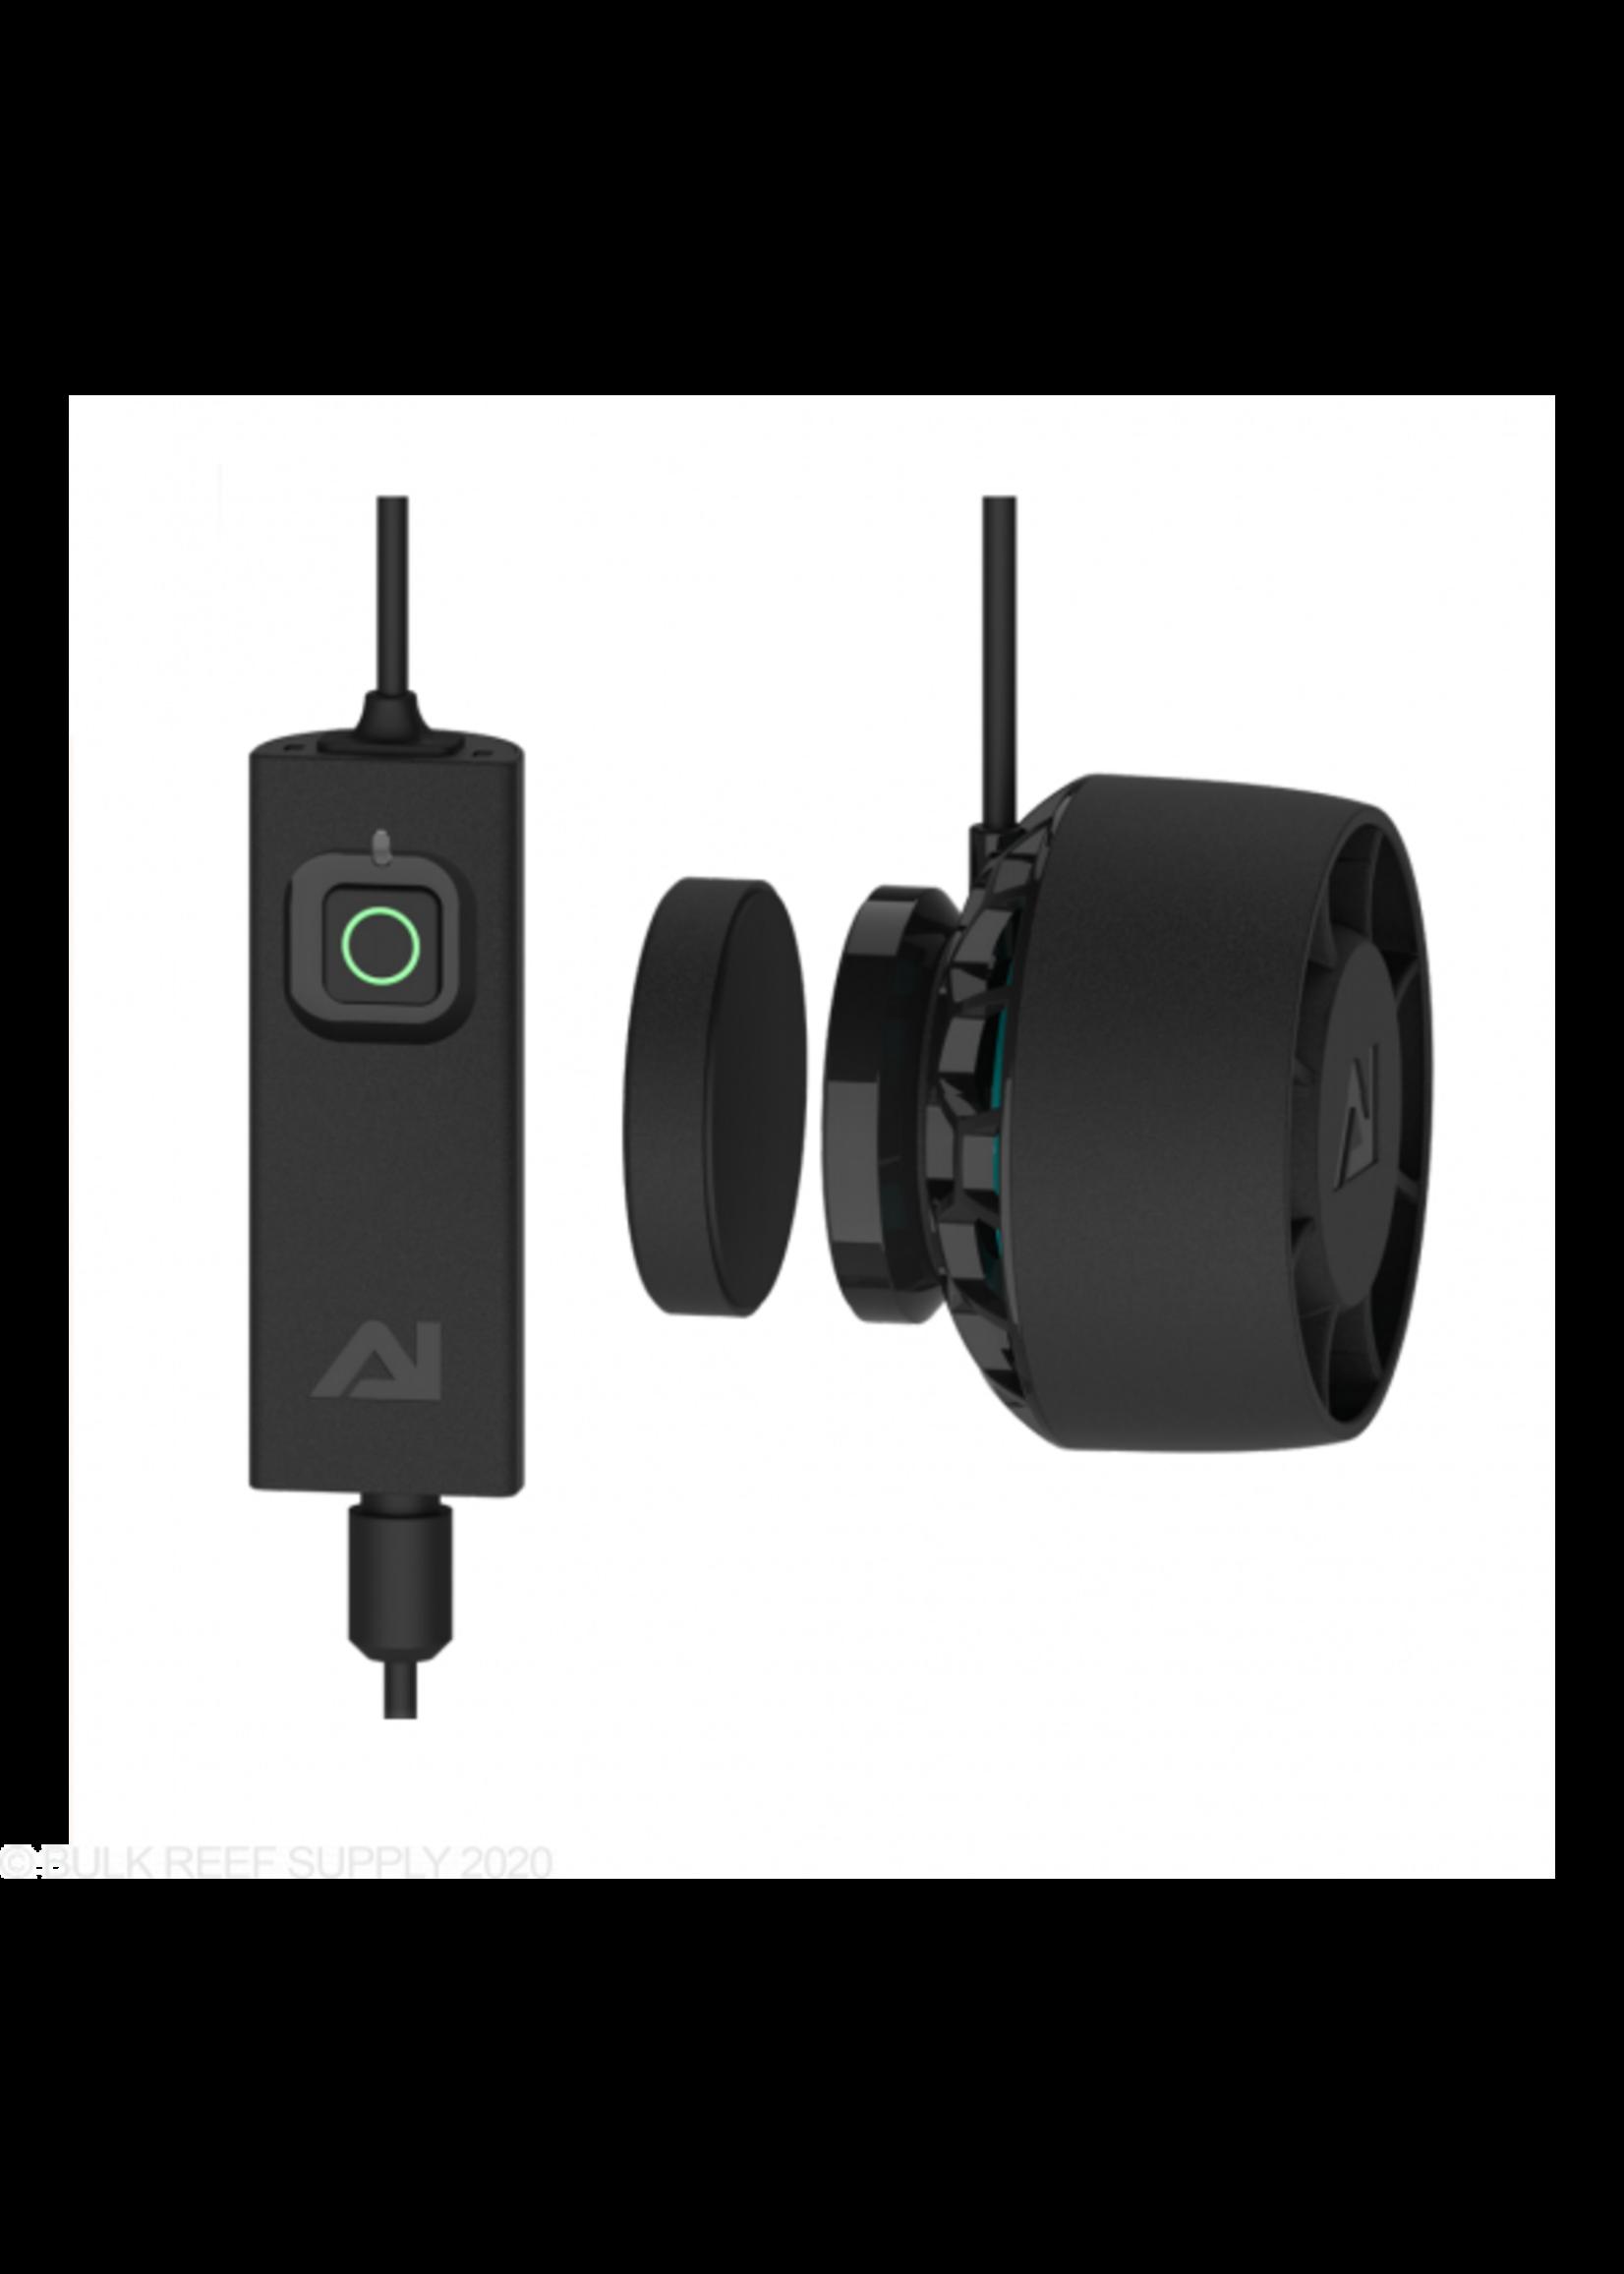 Aqua Illumination Aqua Illumination Nero 5 Pump w/ Controller